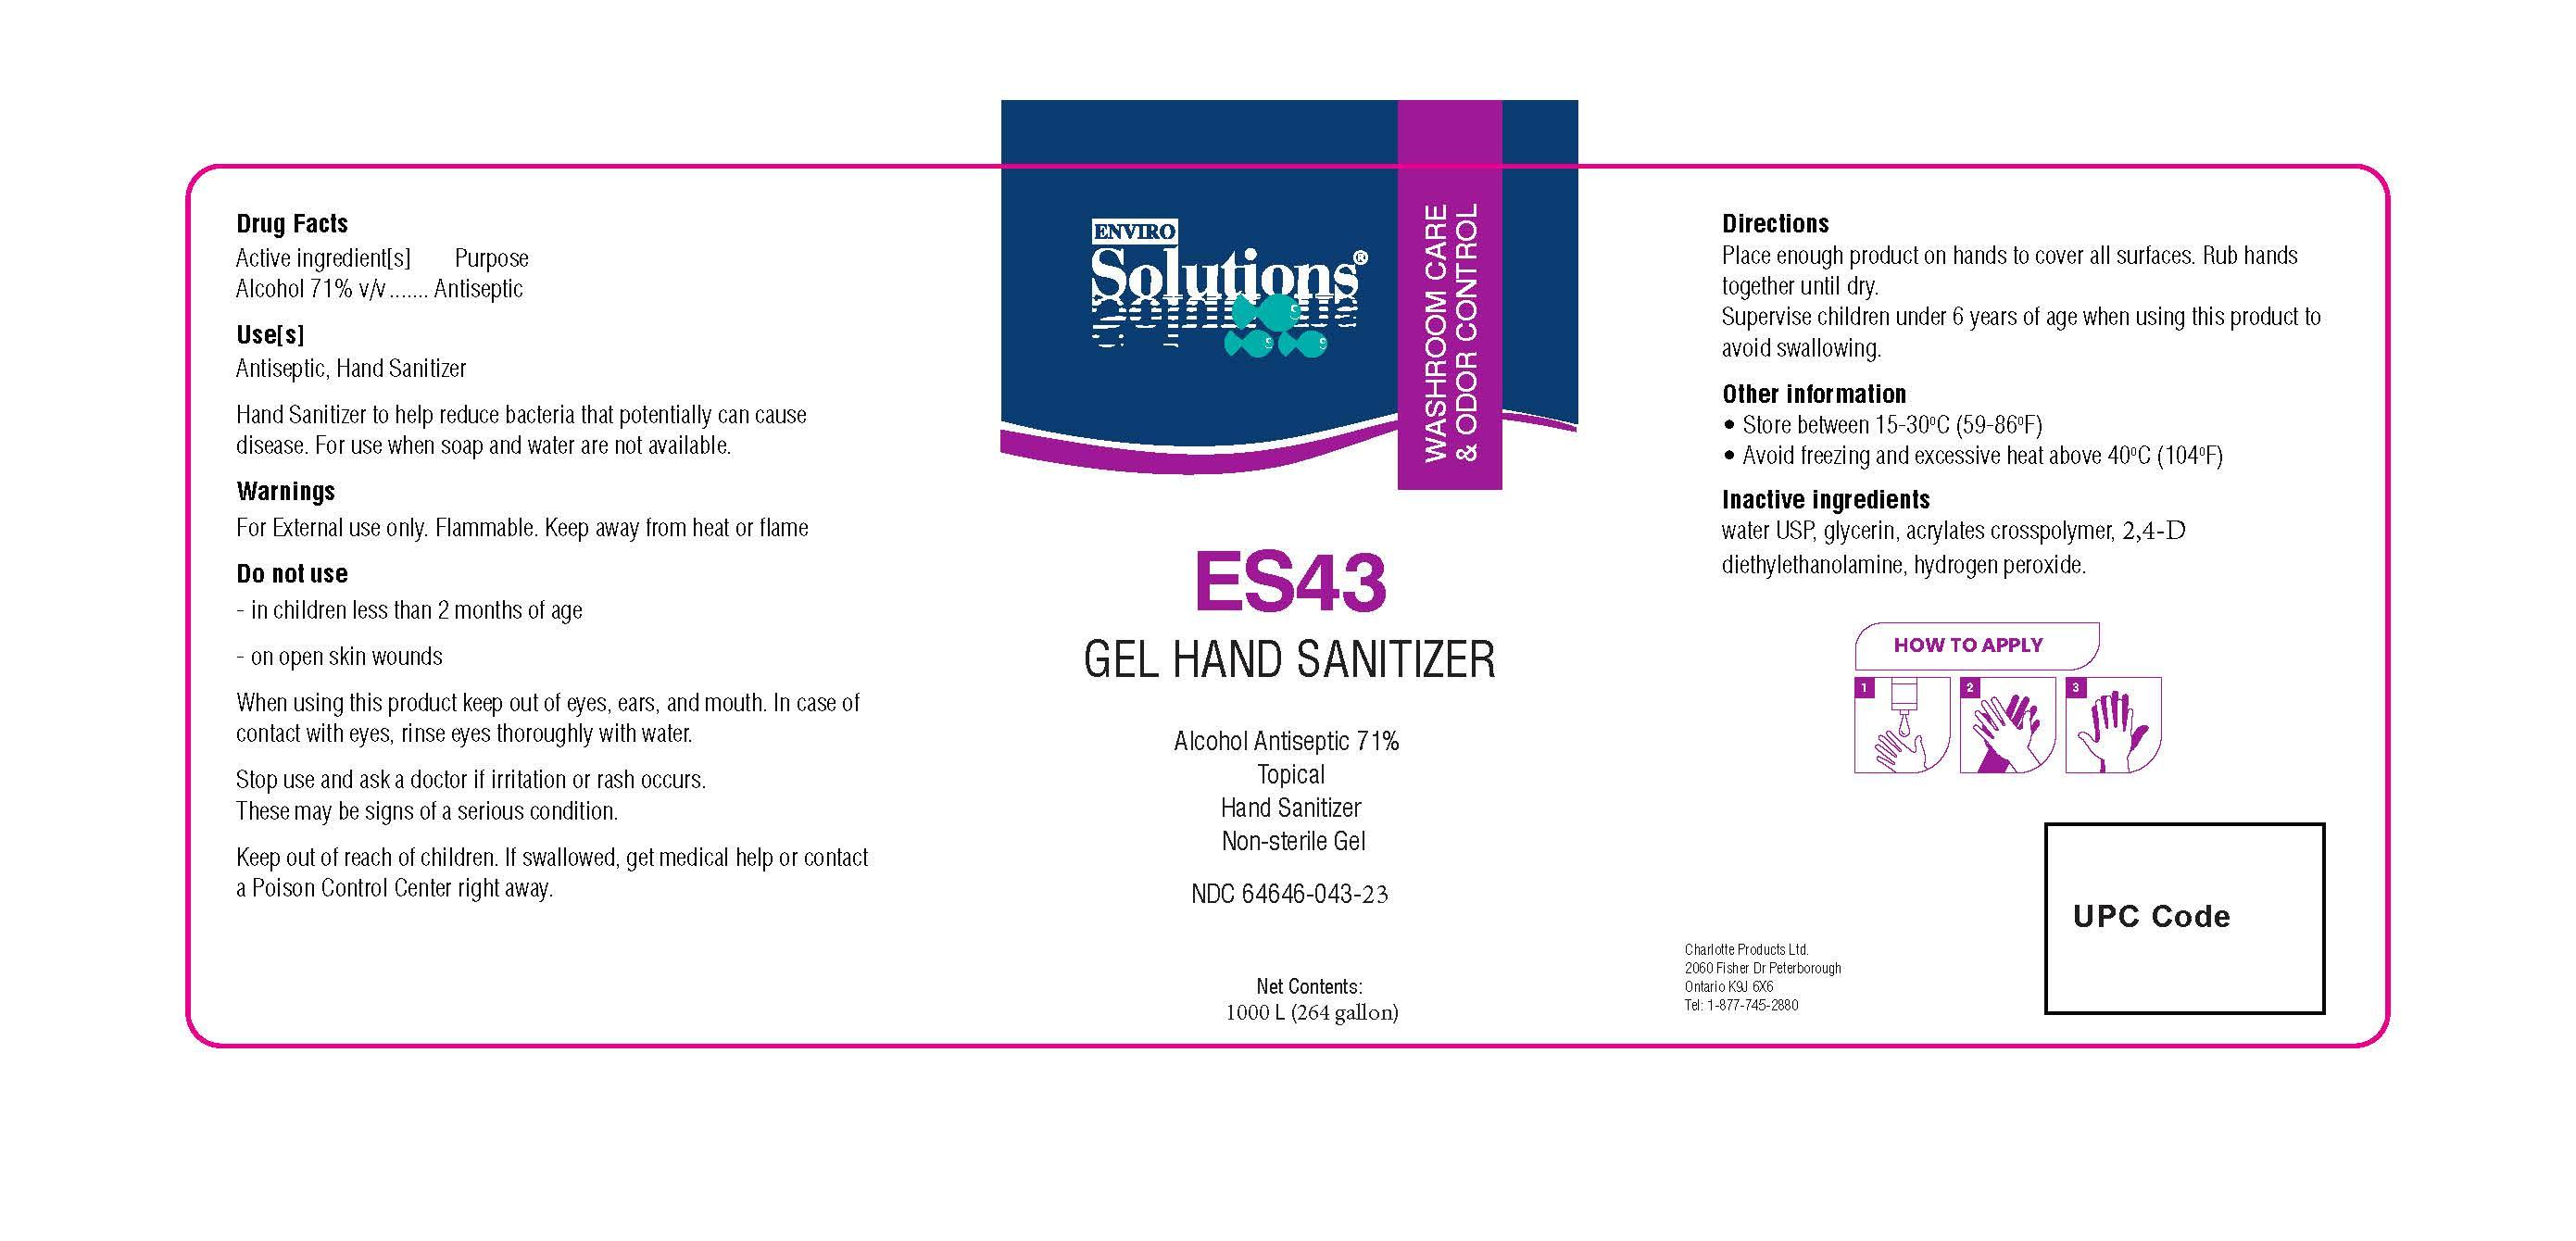 ES43 1000 L Label